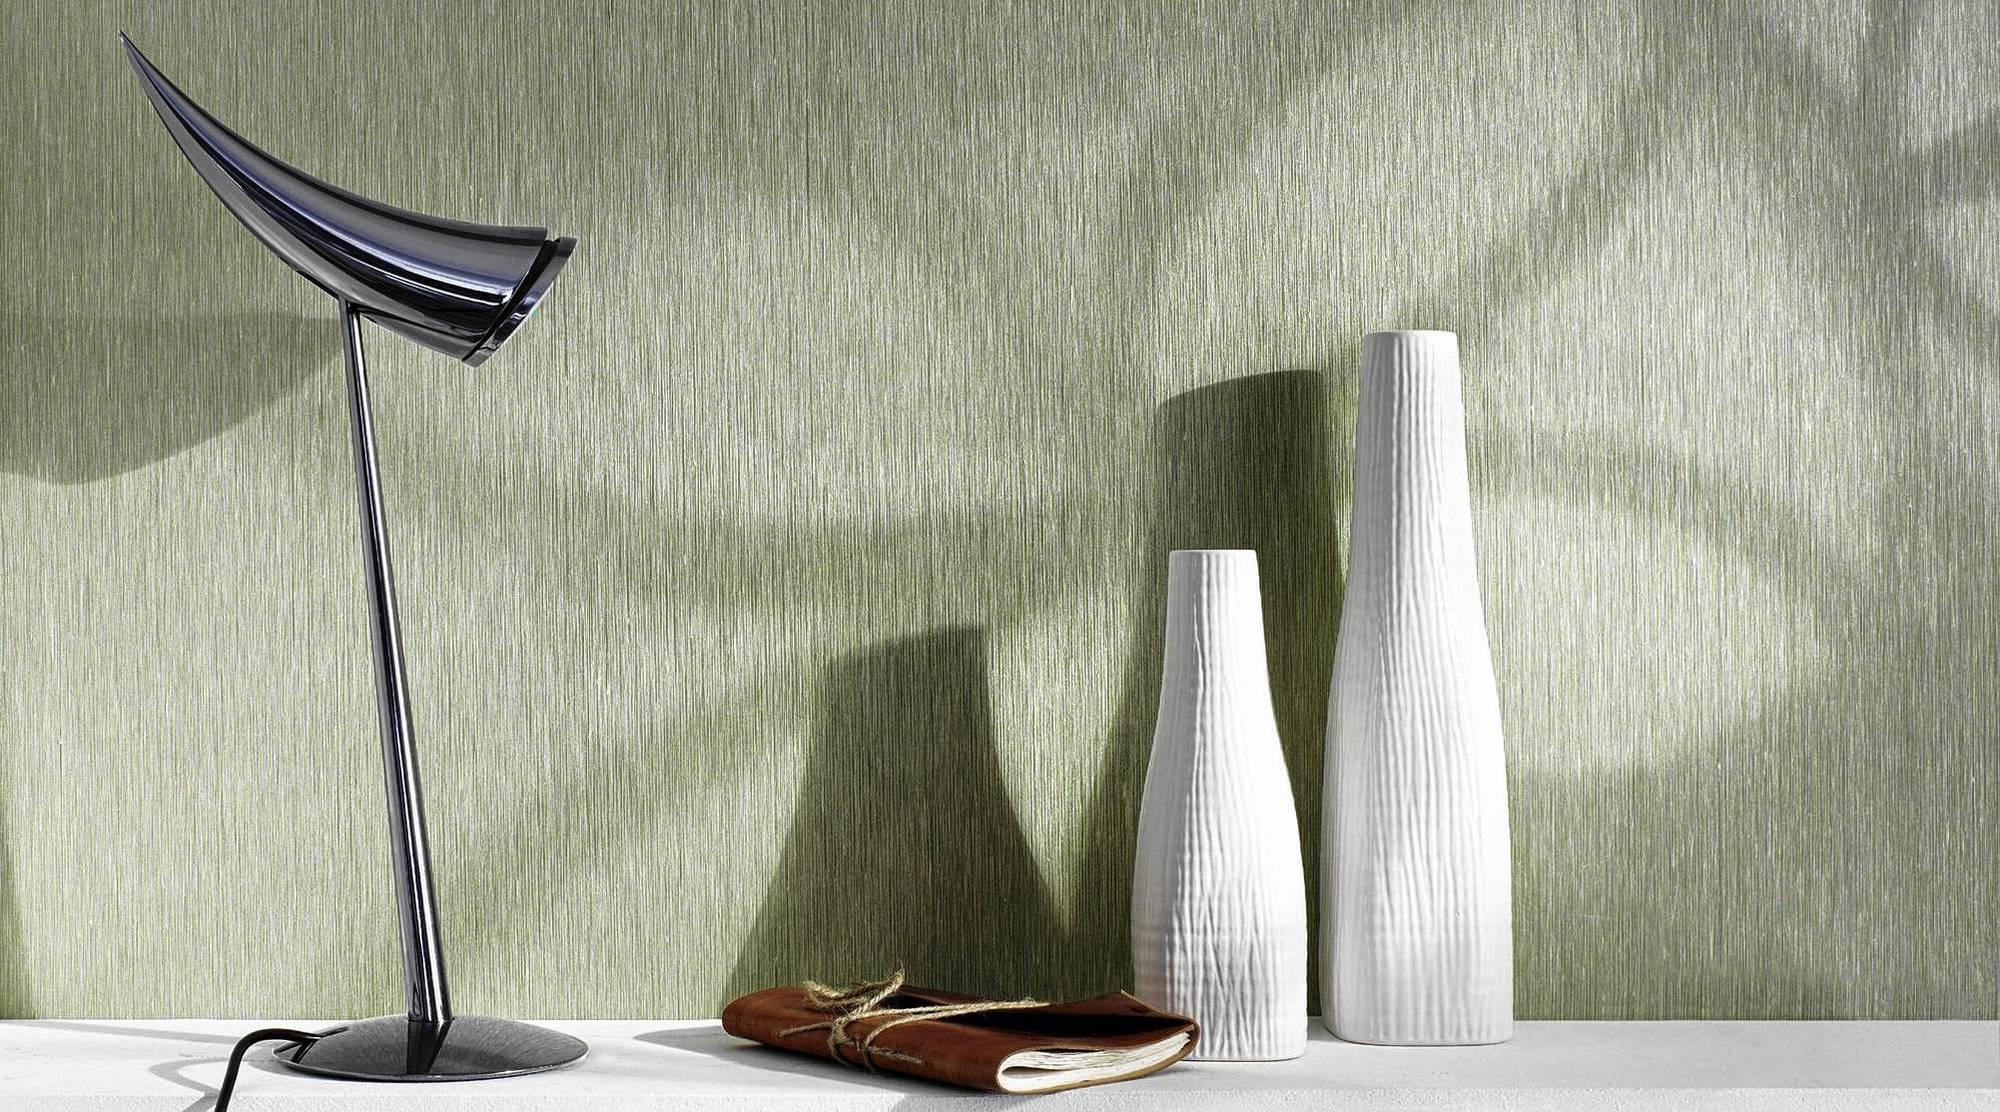 rollenweise natur an der wand immomorgen mannheim. Black Bedroom Furniture Sets. Home Design Ideas